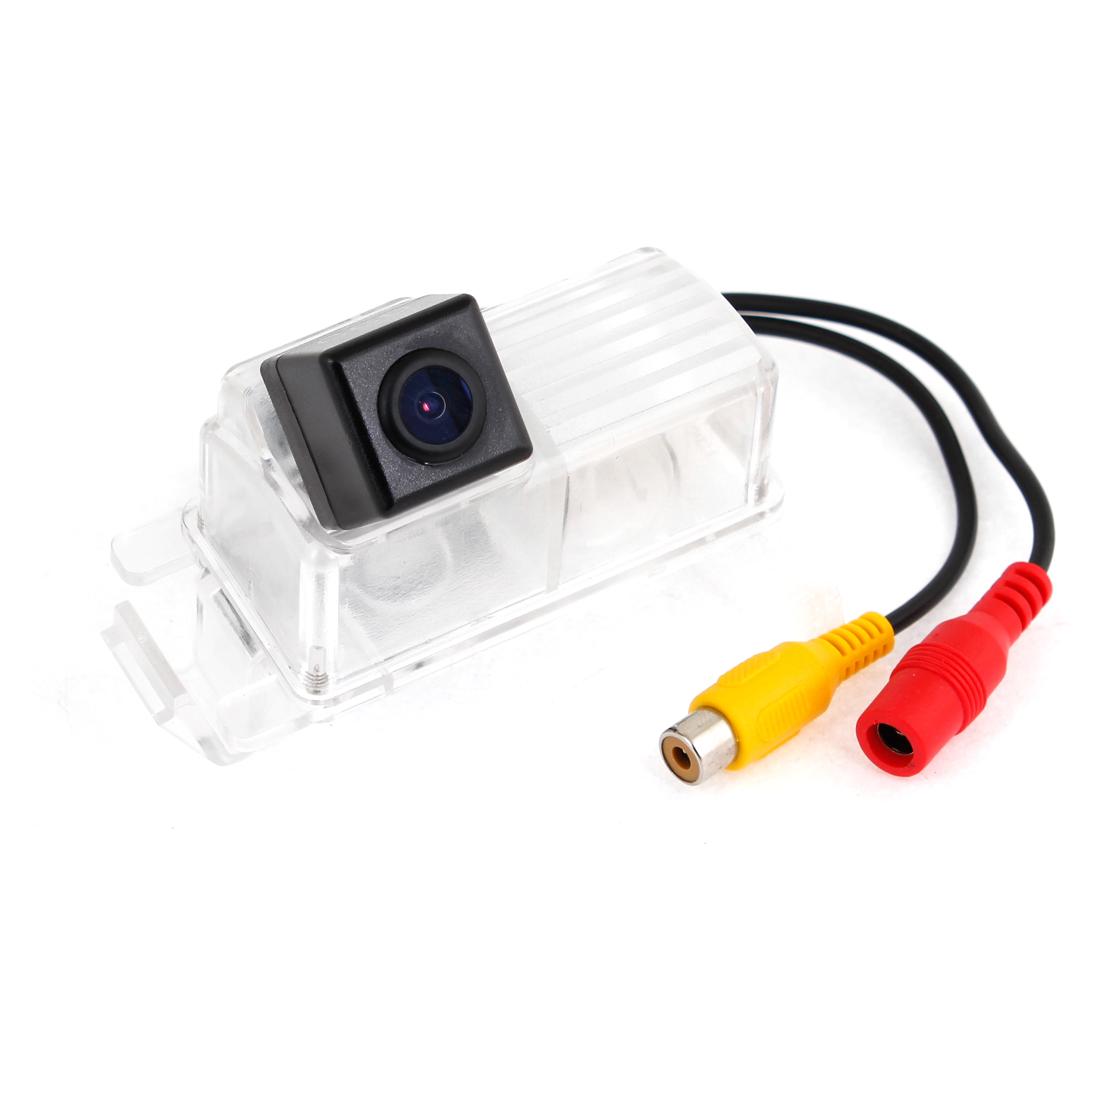 "1/4"" CCD NTSC/PAL HD Backup Rear View Camera for Nissan Livina"